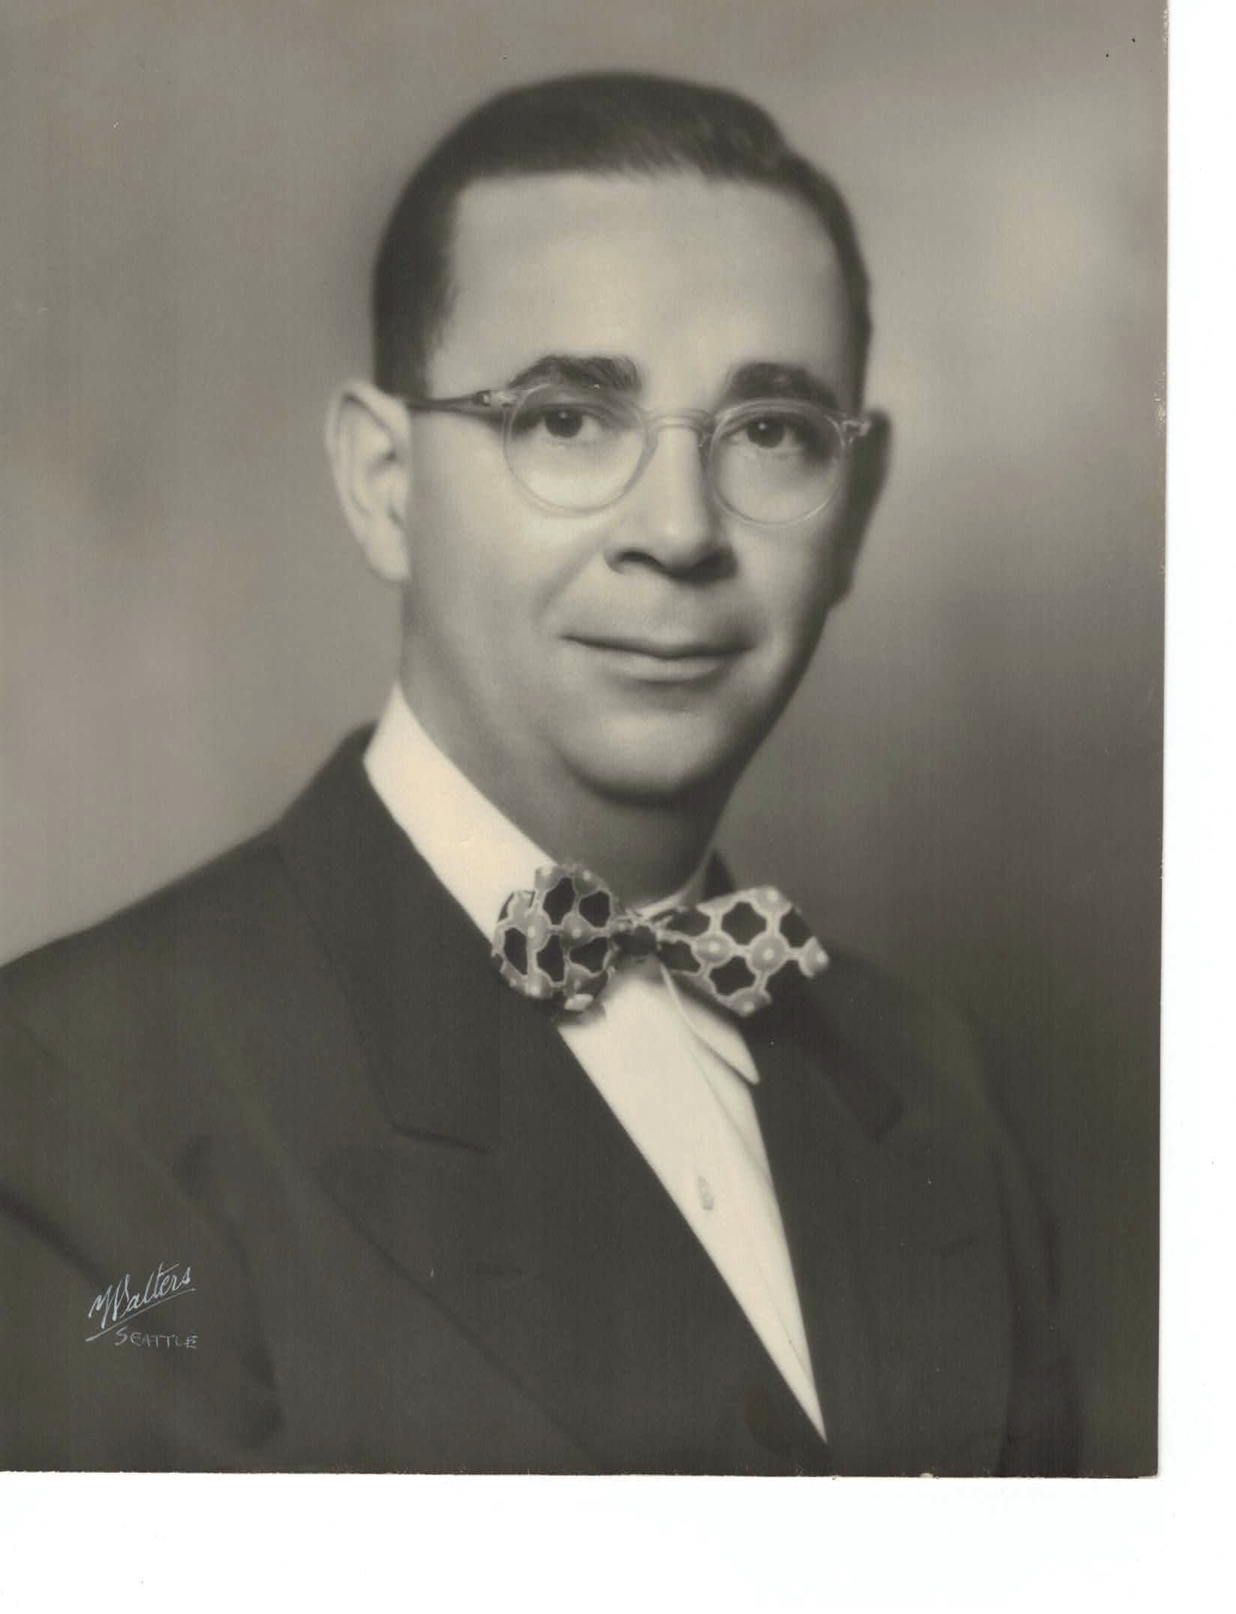 WALLACE M. HIBBARD 1941-42